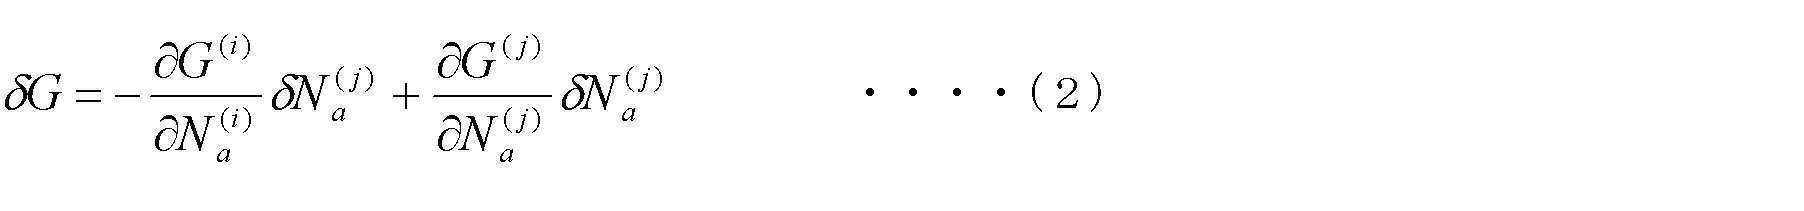 Figure 112013032473973-pat00002